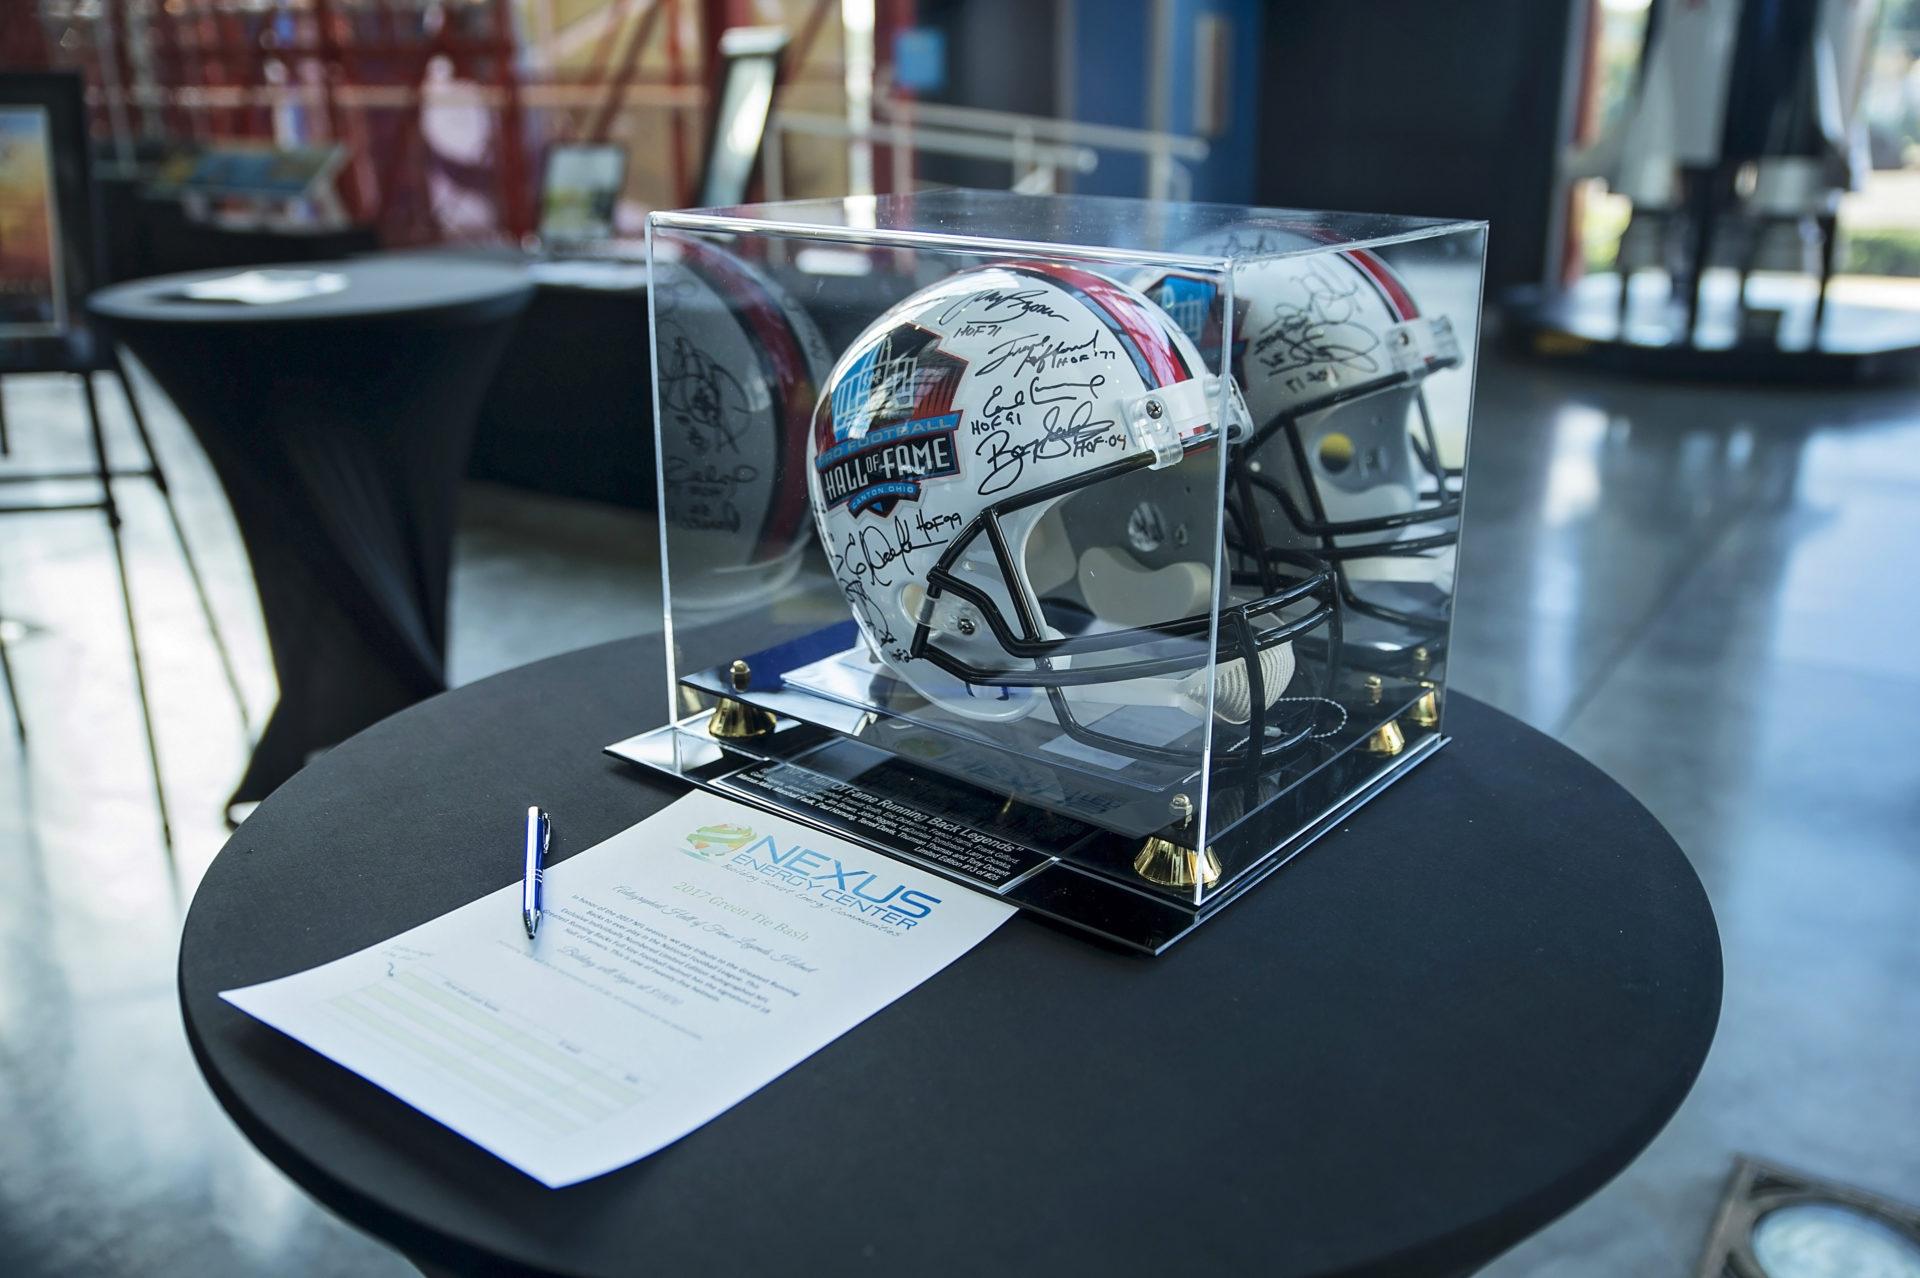 Auction Item: NFL Running Back Hall of Fame Helmet